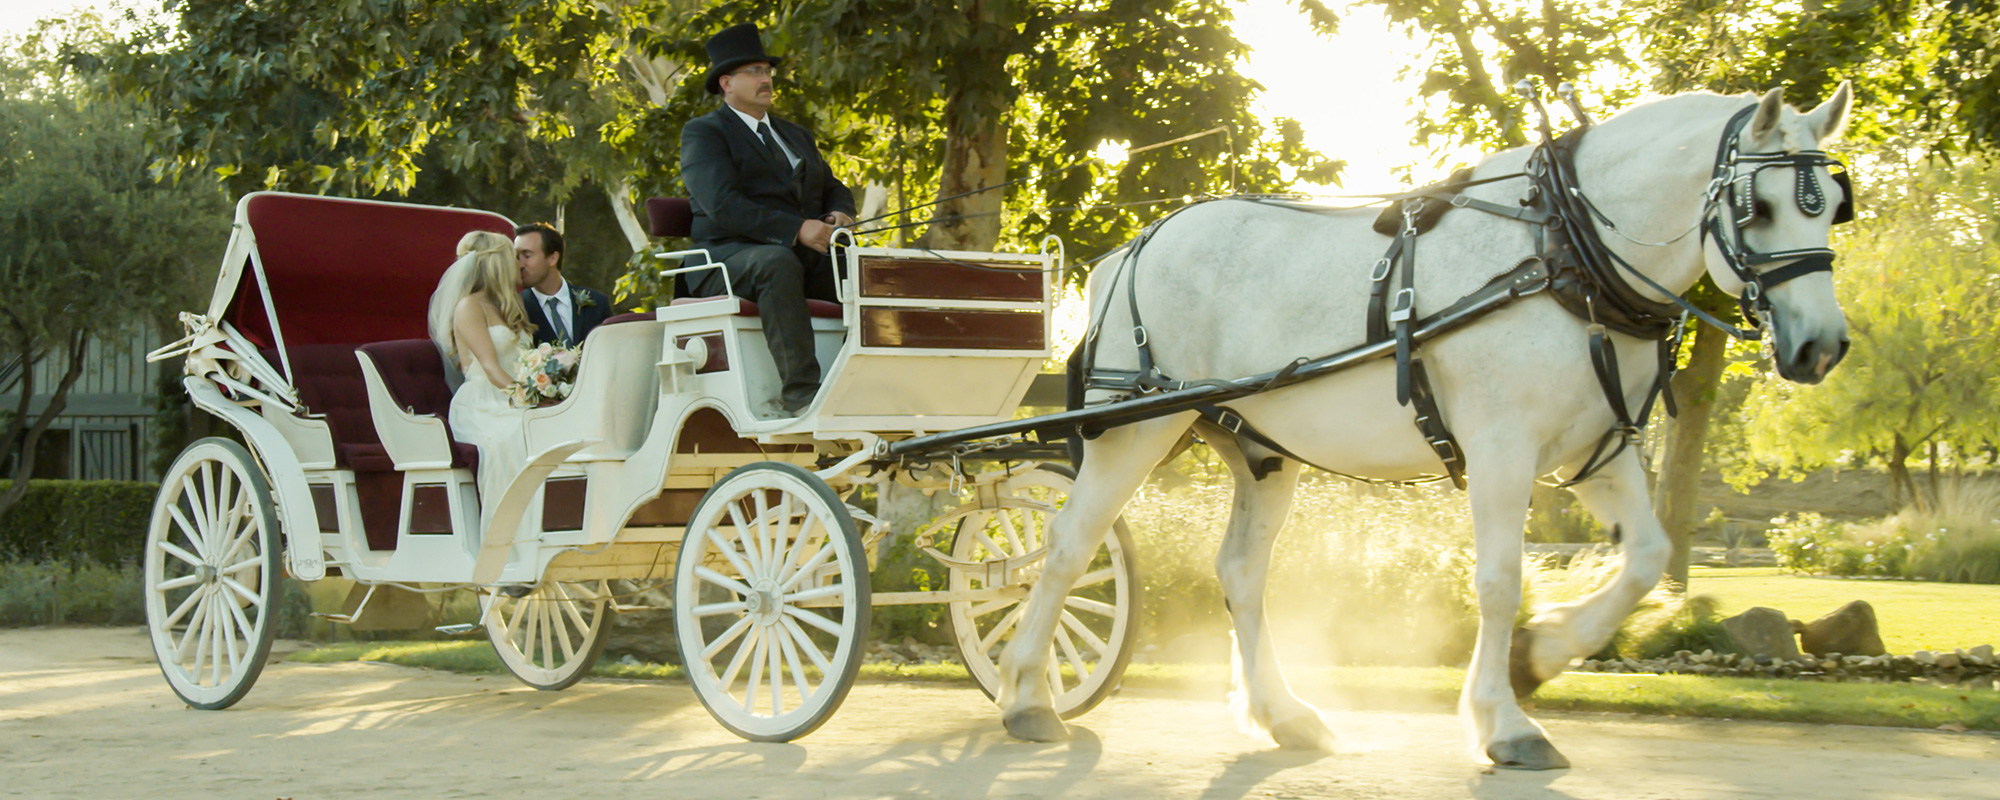 Horse-Drawn Carriage Rides | Temecula, CA - Temecula Carriage Company